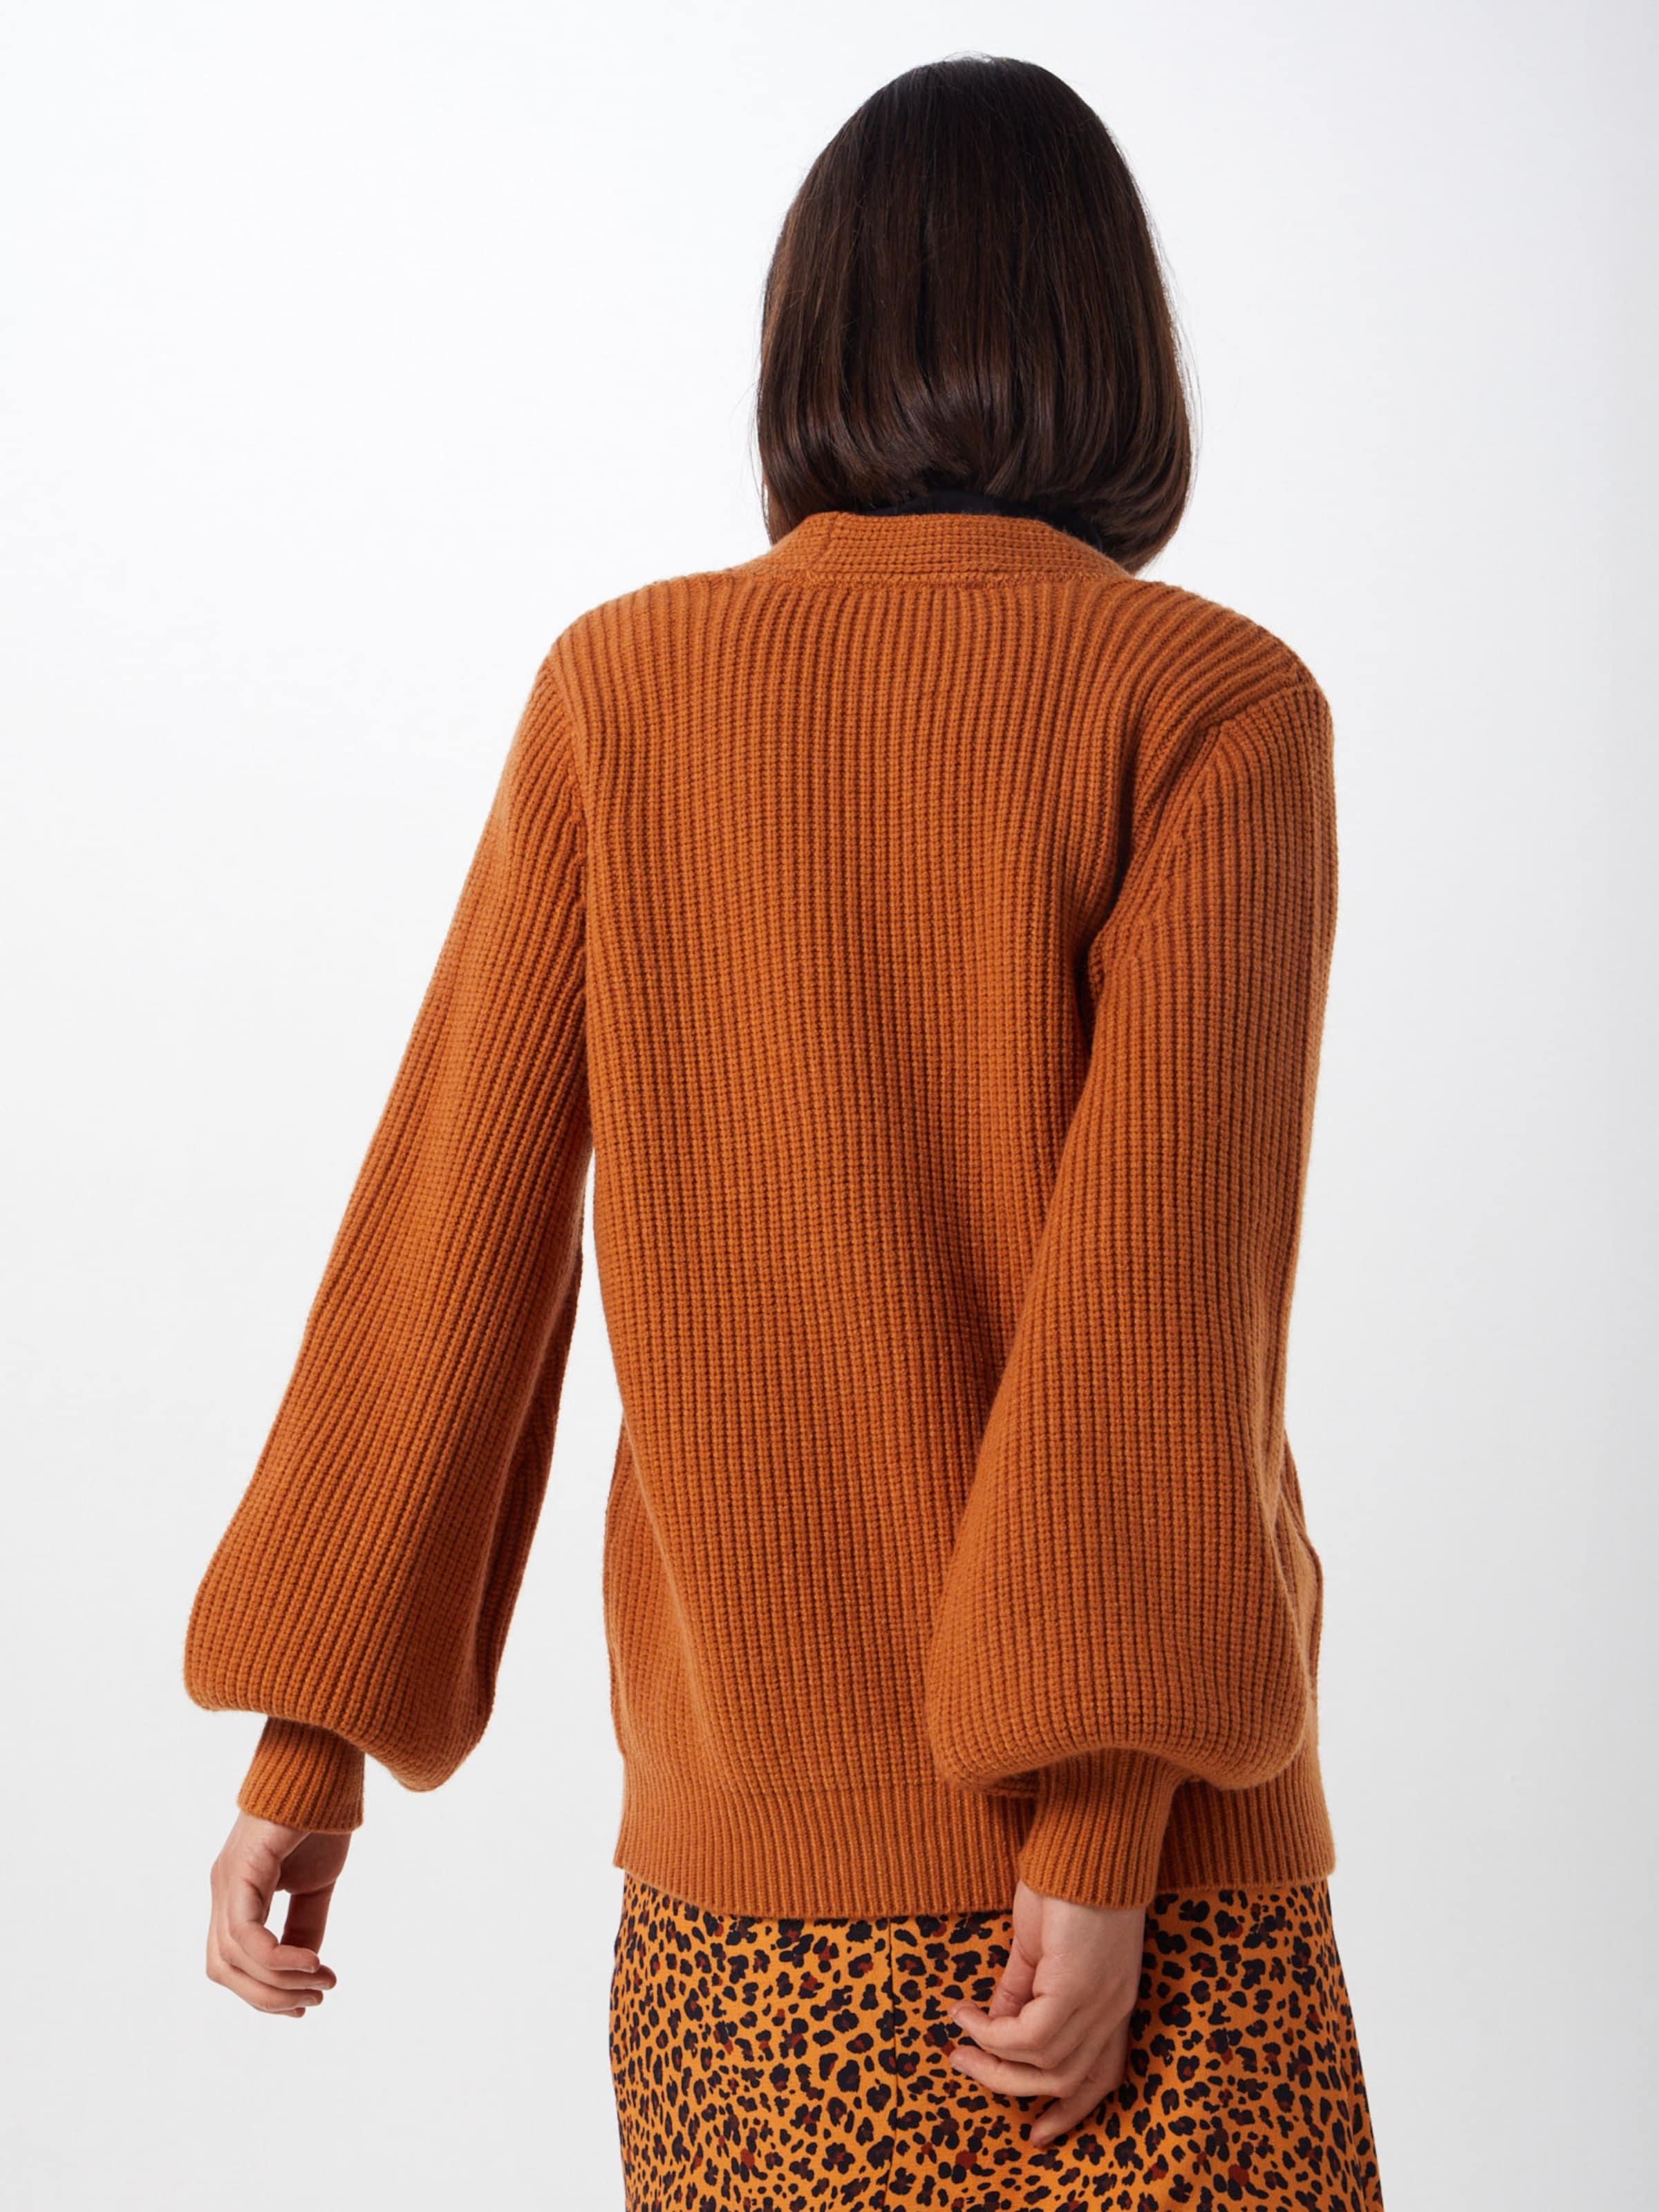 Just 'sophie' Female In Strickjacke Orange byIgvY6mf7